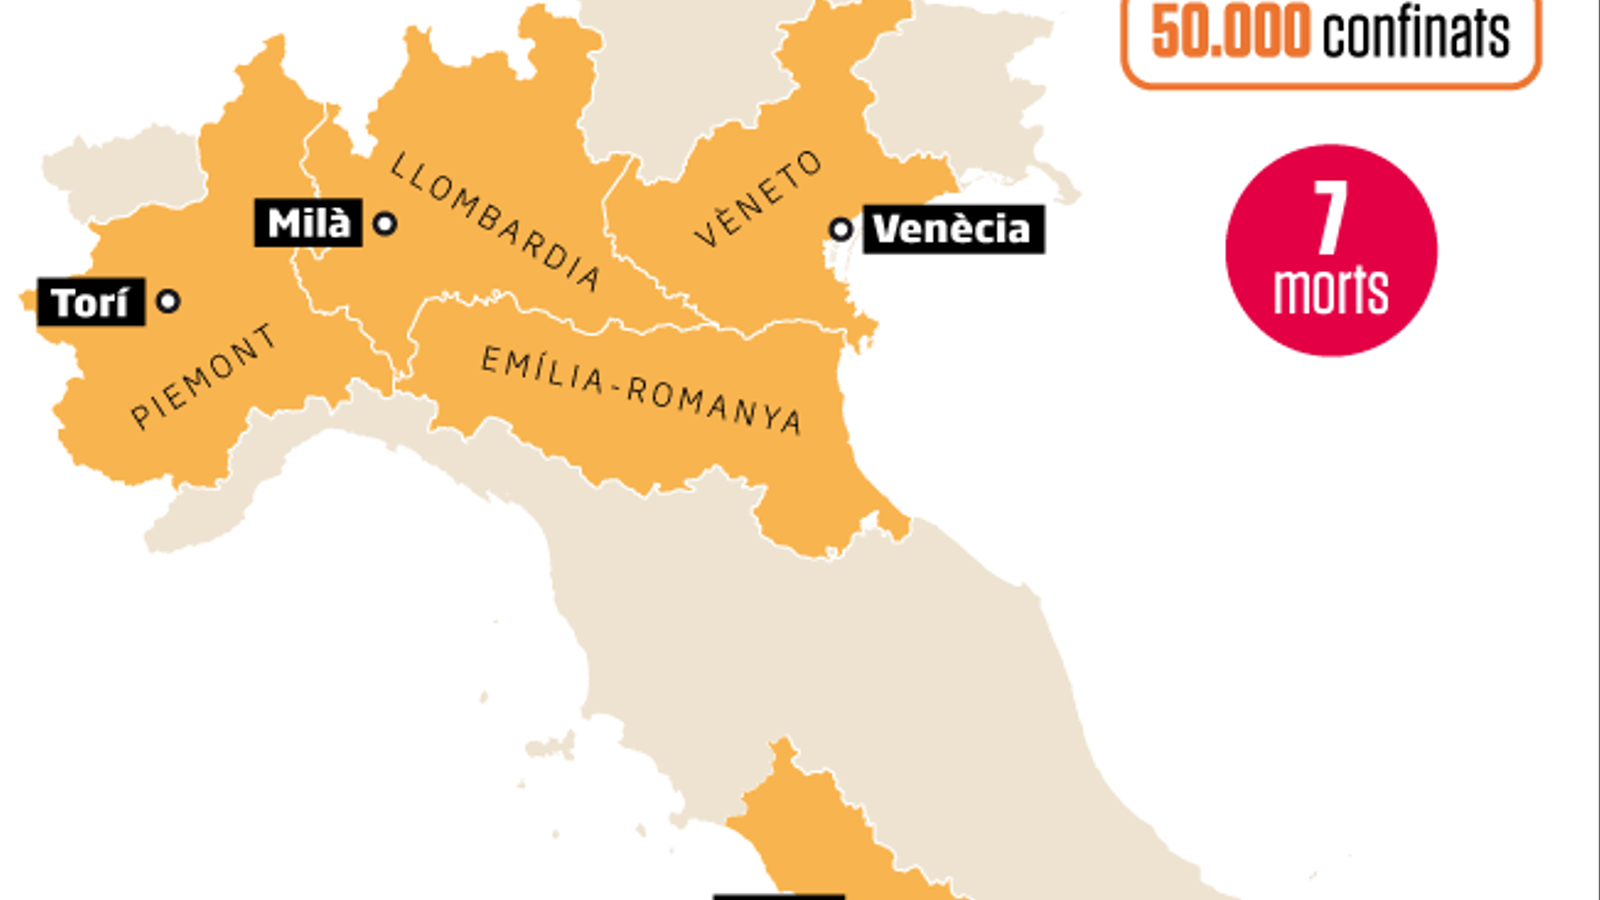 Set morts pel coronavirus a Itàlia